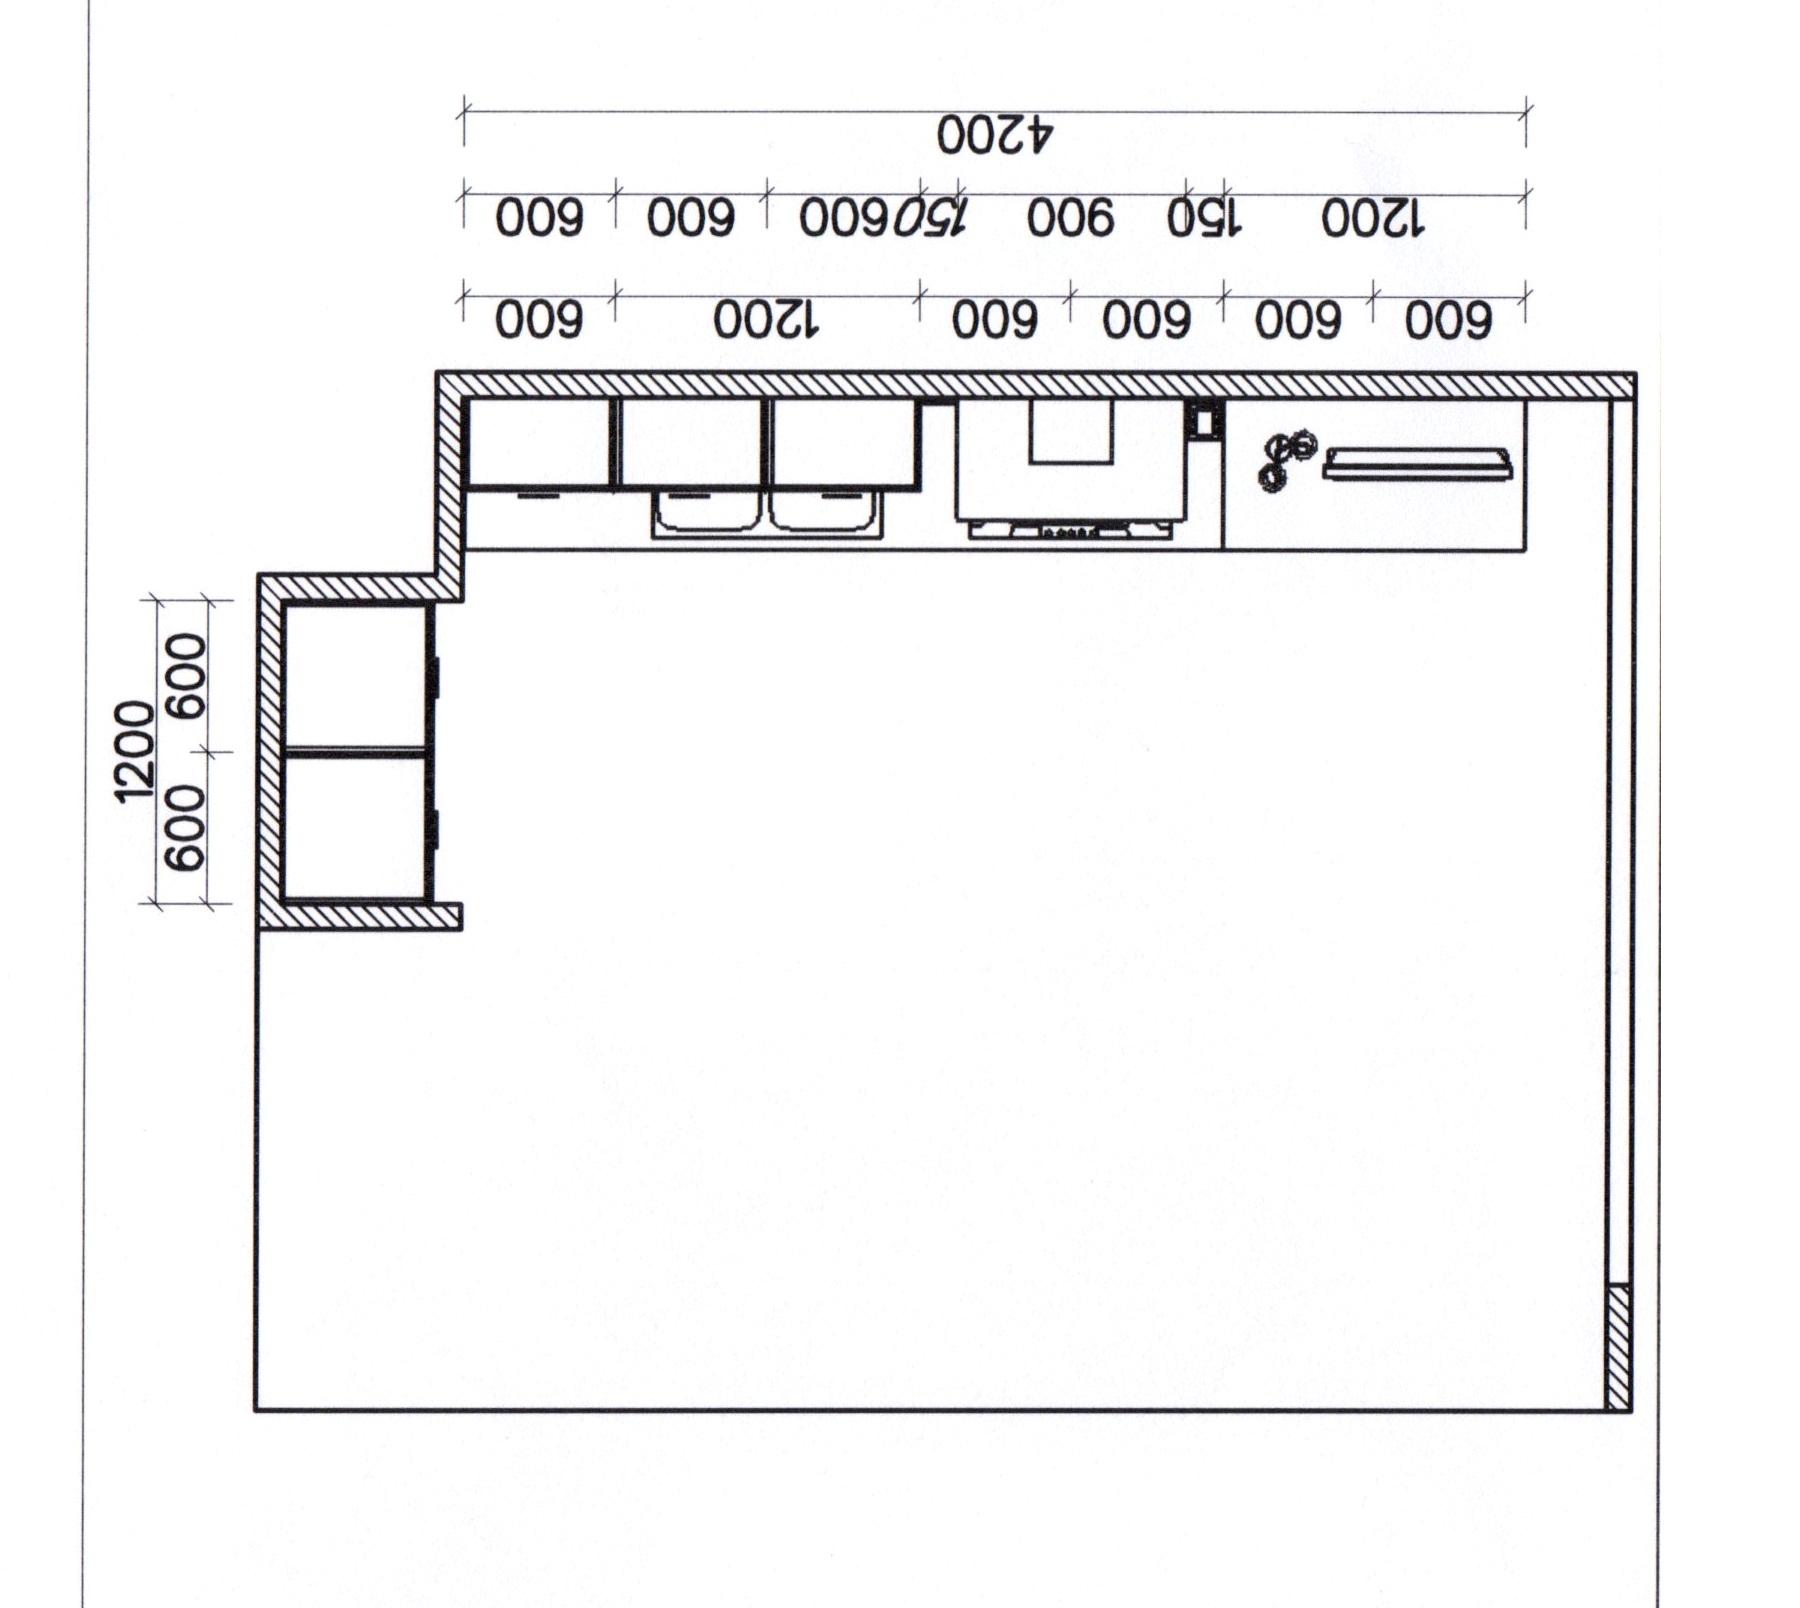 Misure angolo cucina isola cucina ikea dimensioni - Misure cucine ikea ...